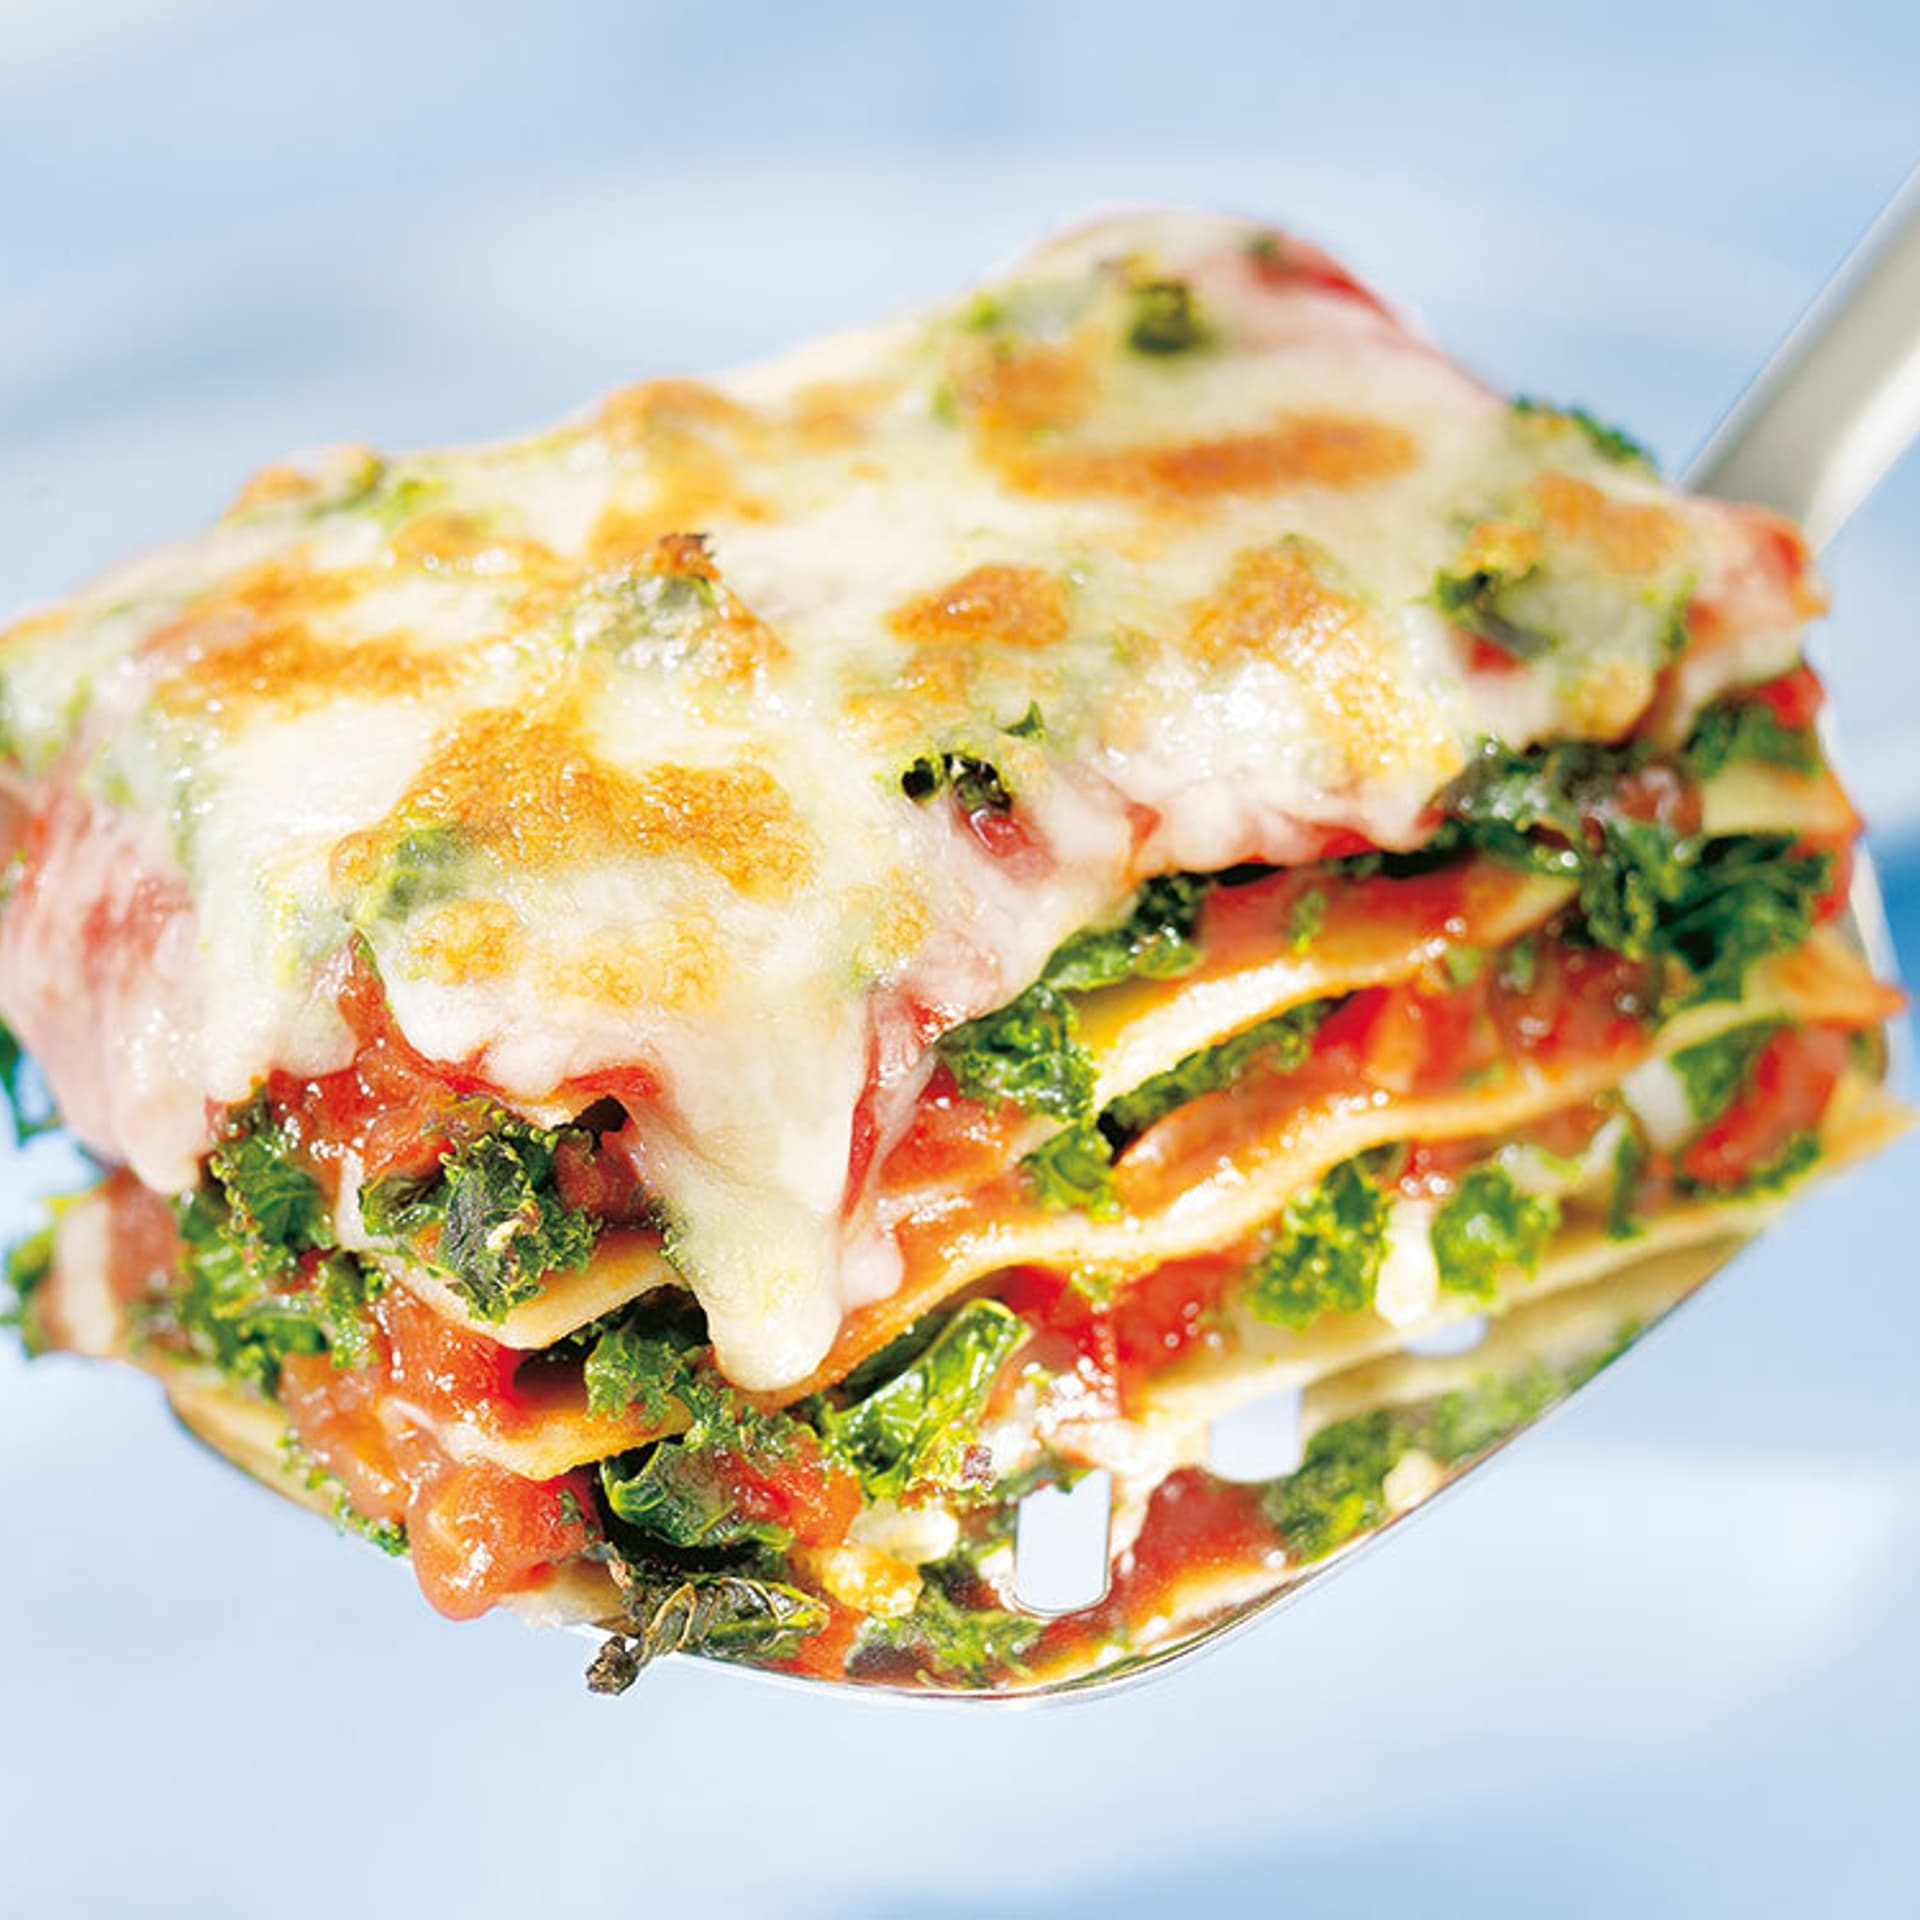 Grünkohl lasagne mit tomatensoße